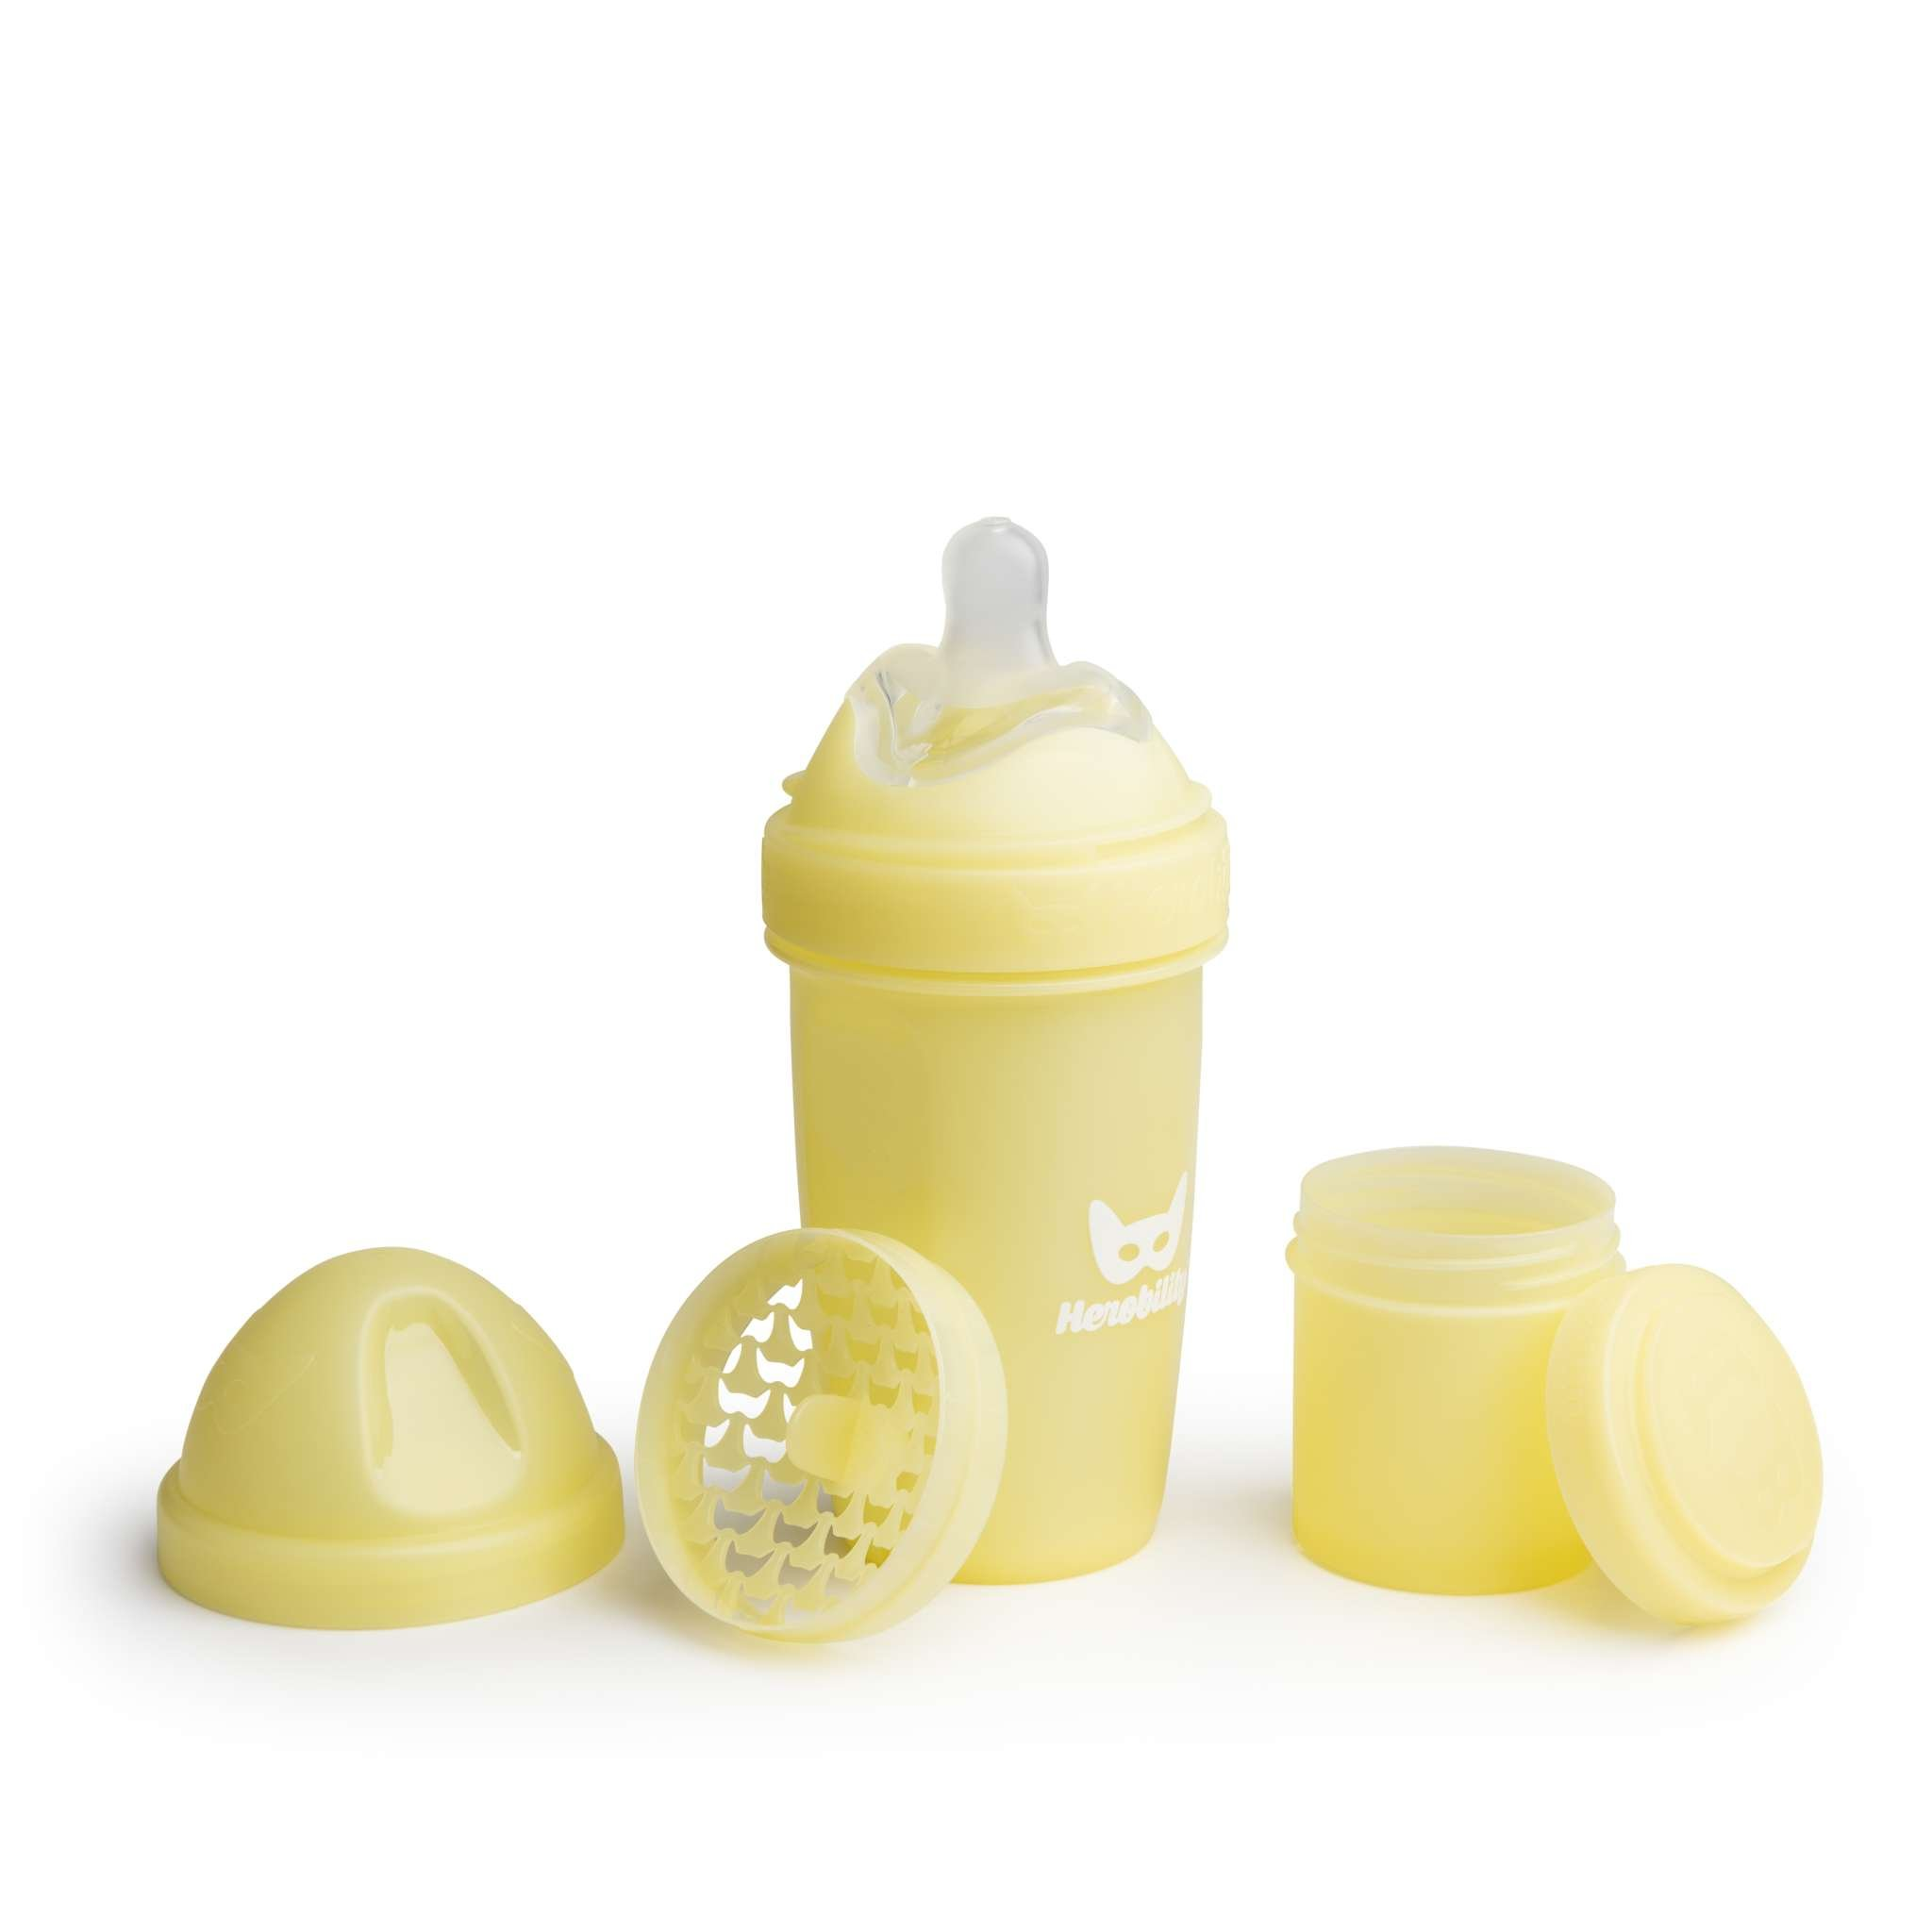 Herobility - butelka antykolkowa Herobottle 240 ml, żółty + smoczek M (2 m+)